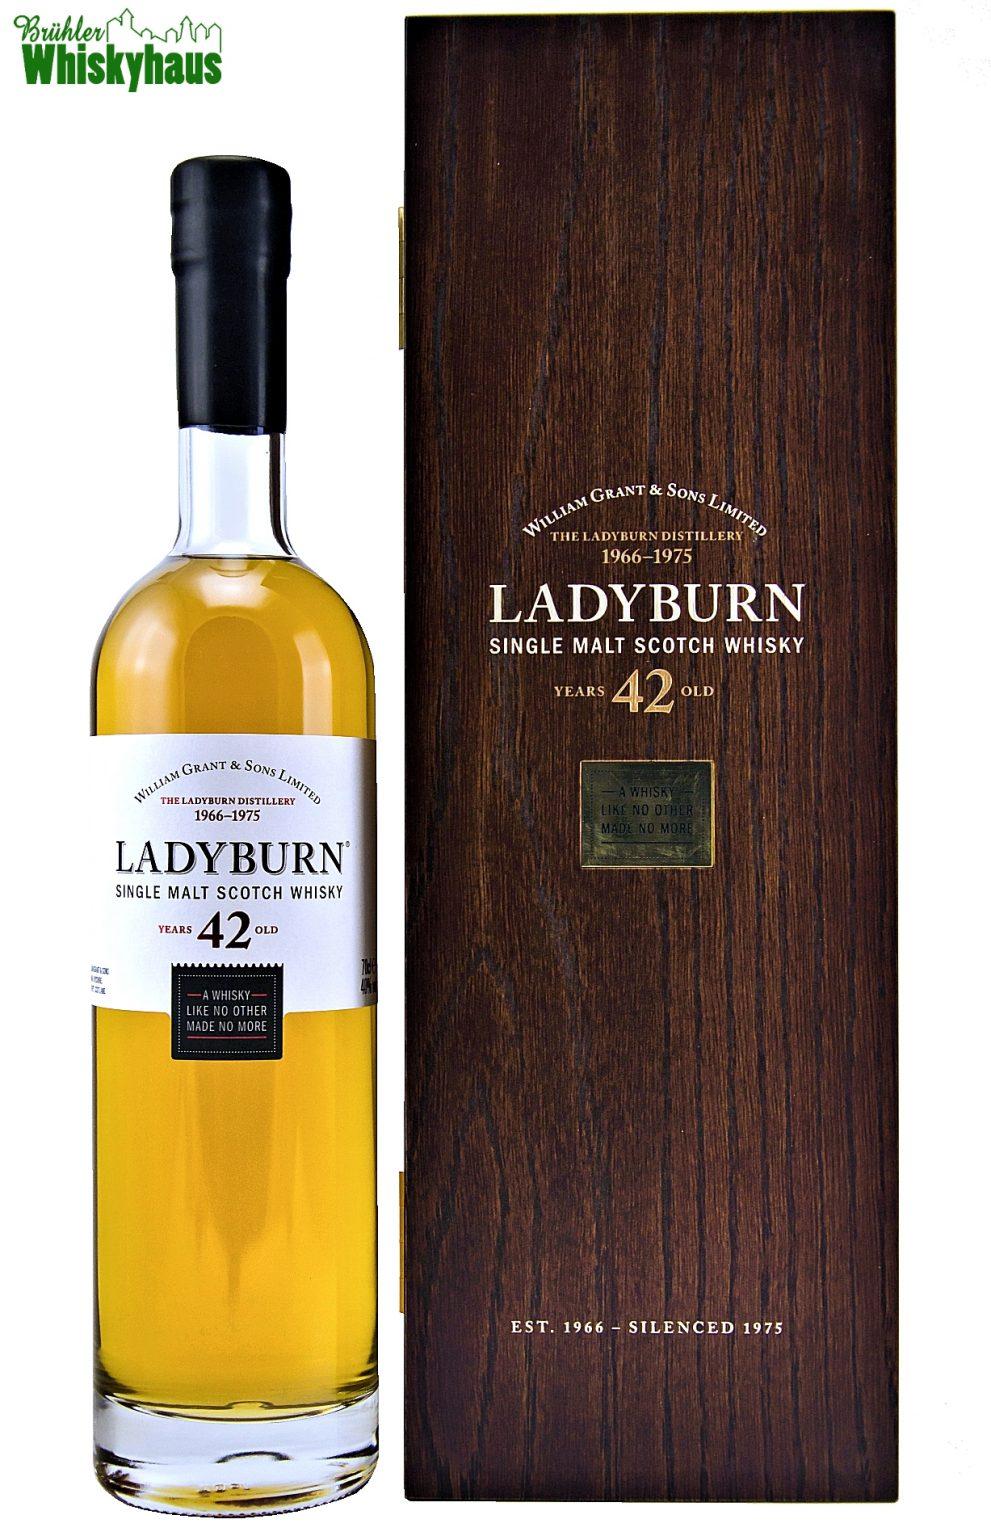 Ladyburn Vintage 1972 - 42 Jahre - Rare Collection - Single Malt Scotch Whisky